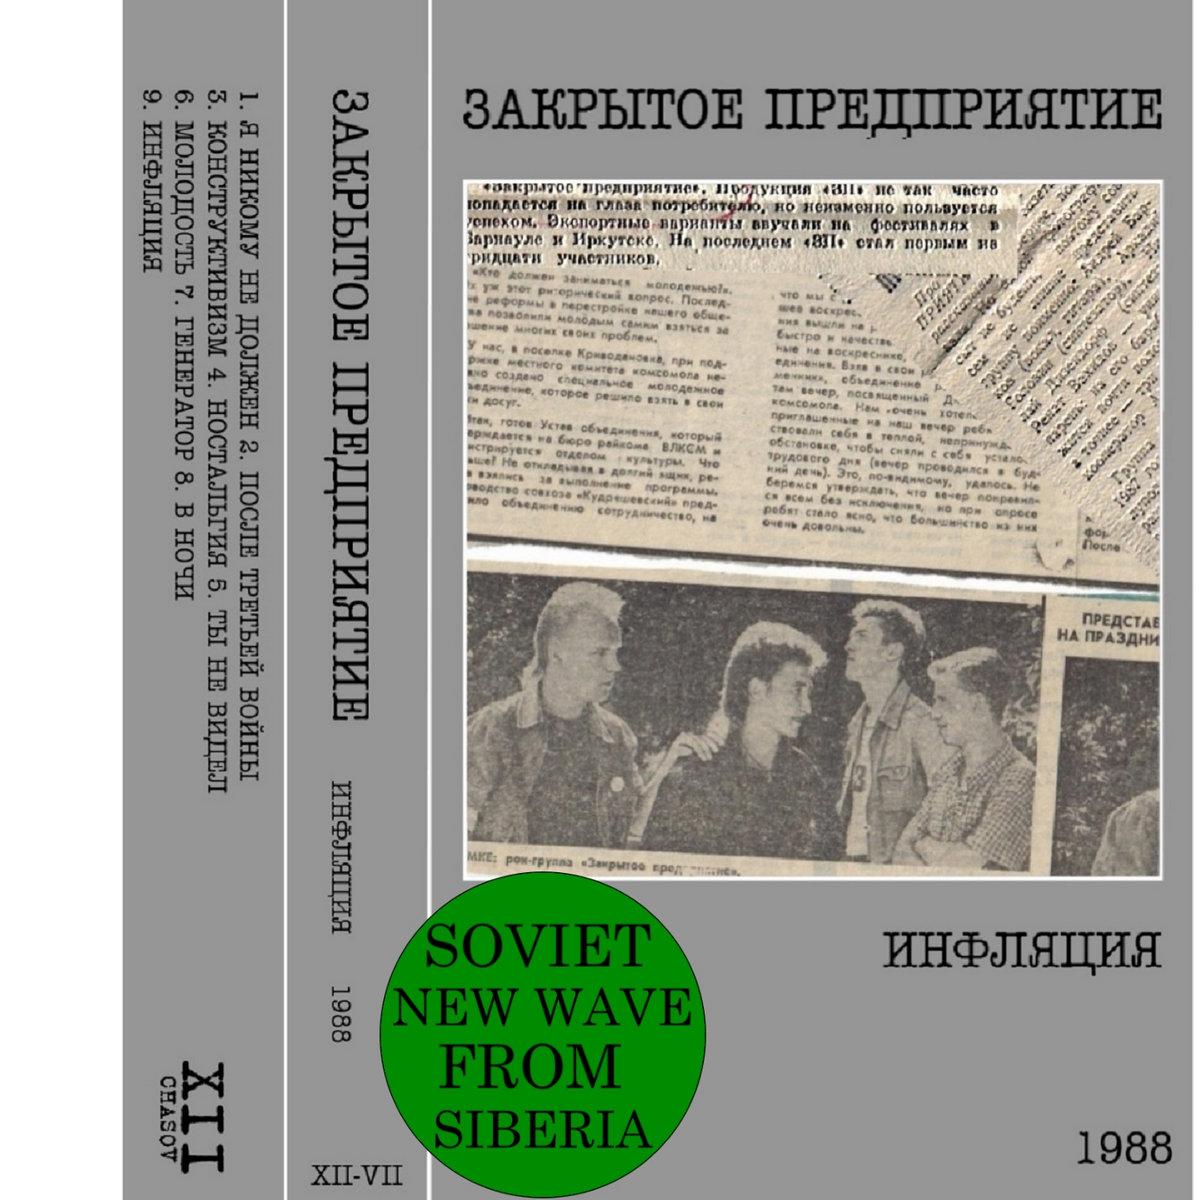 Генератор (Generator) | 12 Chasov records